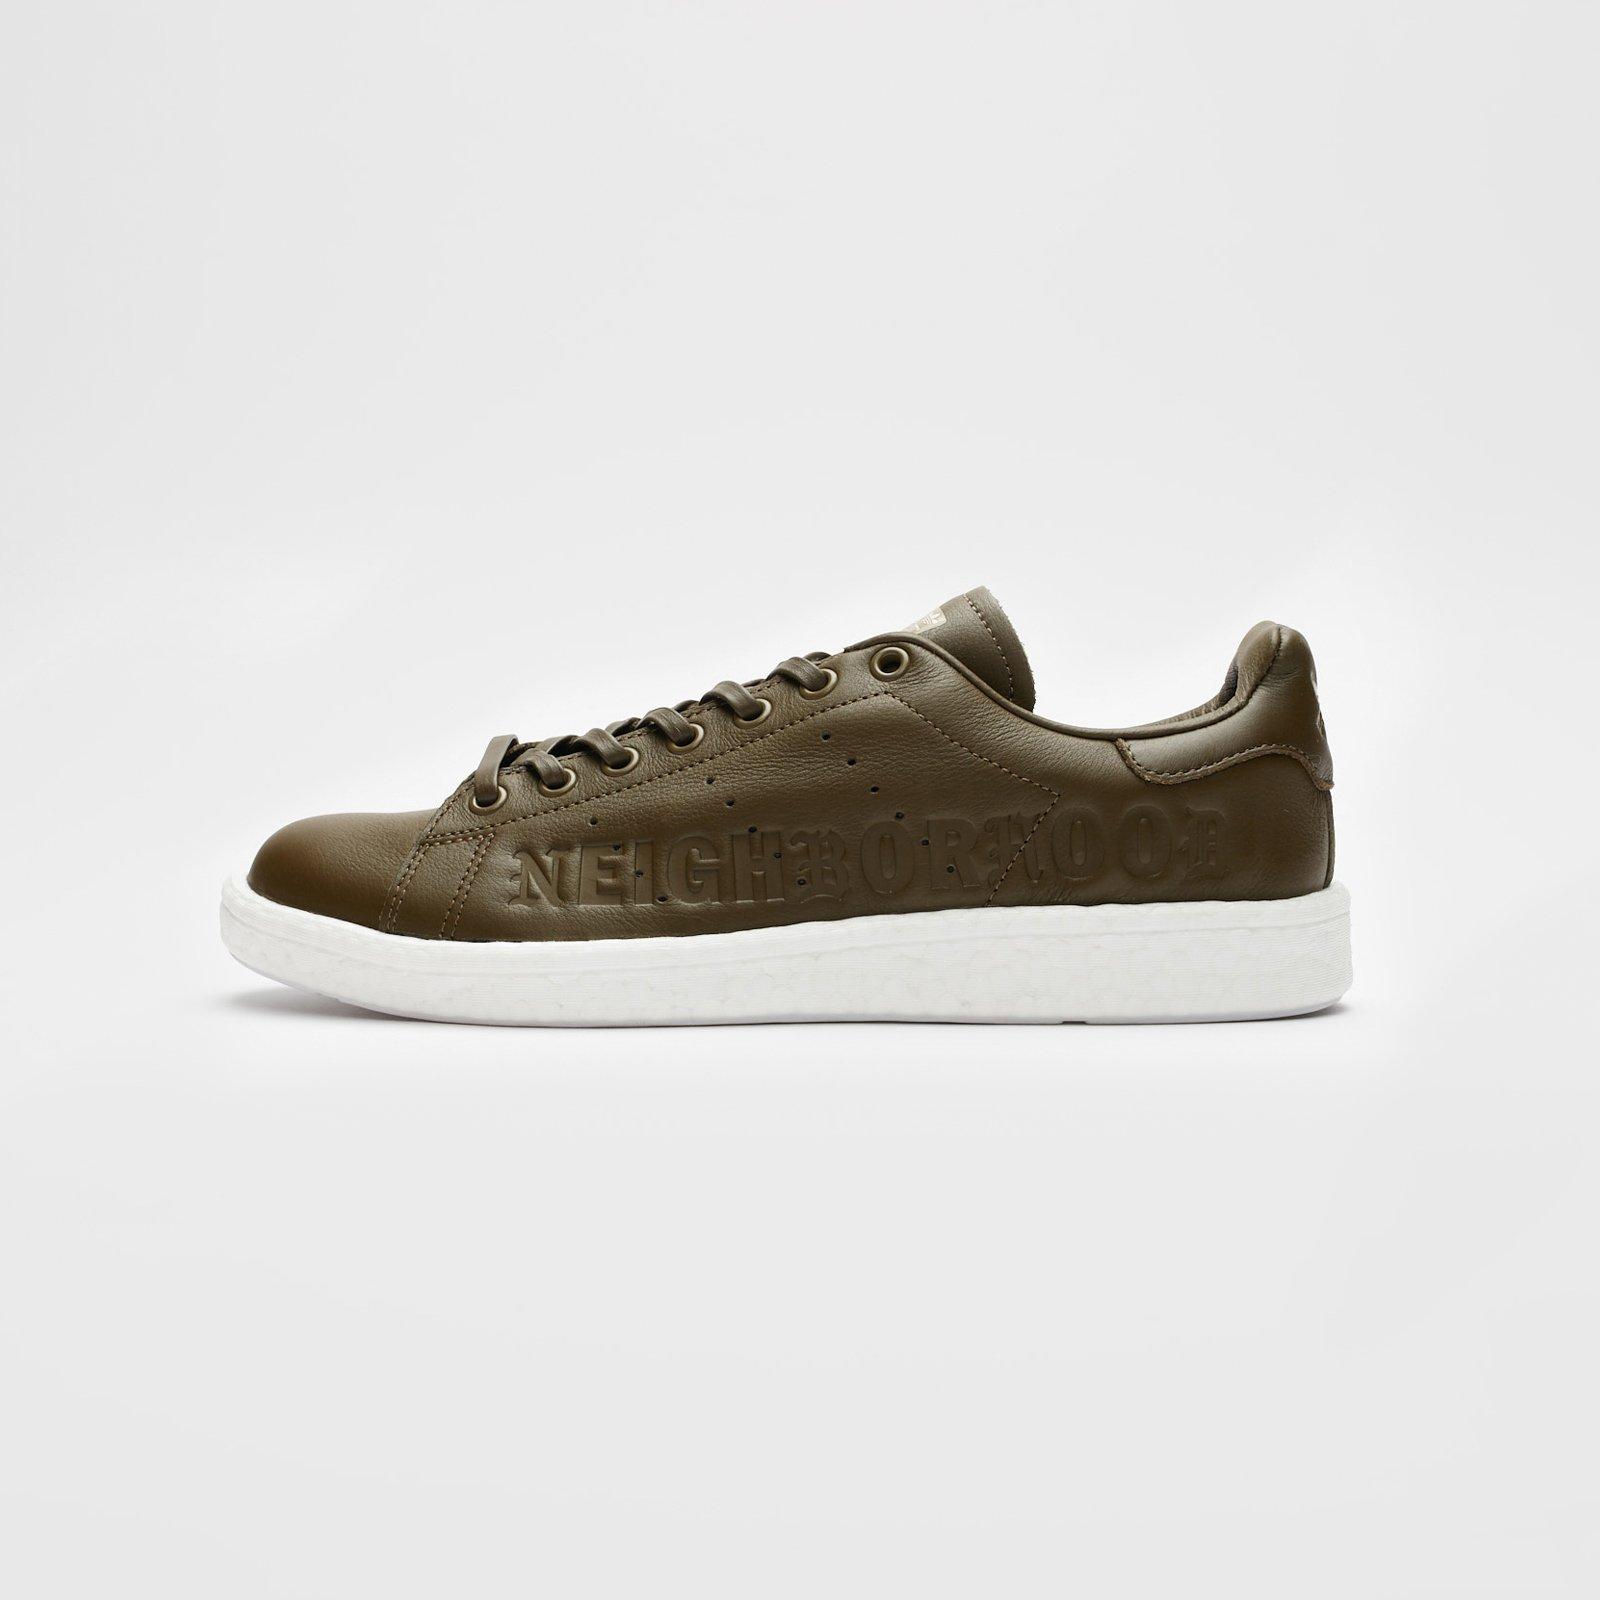 f7b7627d94dc0e adidas Stan Smith x NBHD - B37342 - Sneakersnstuff